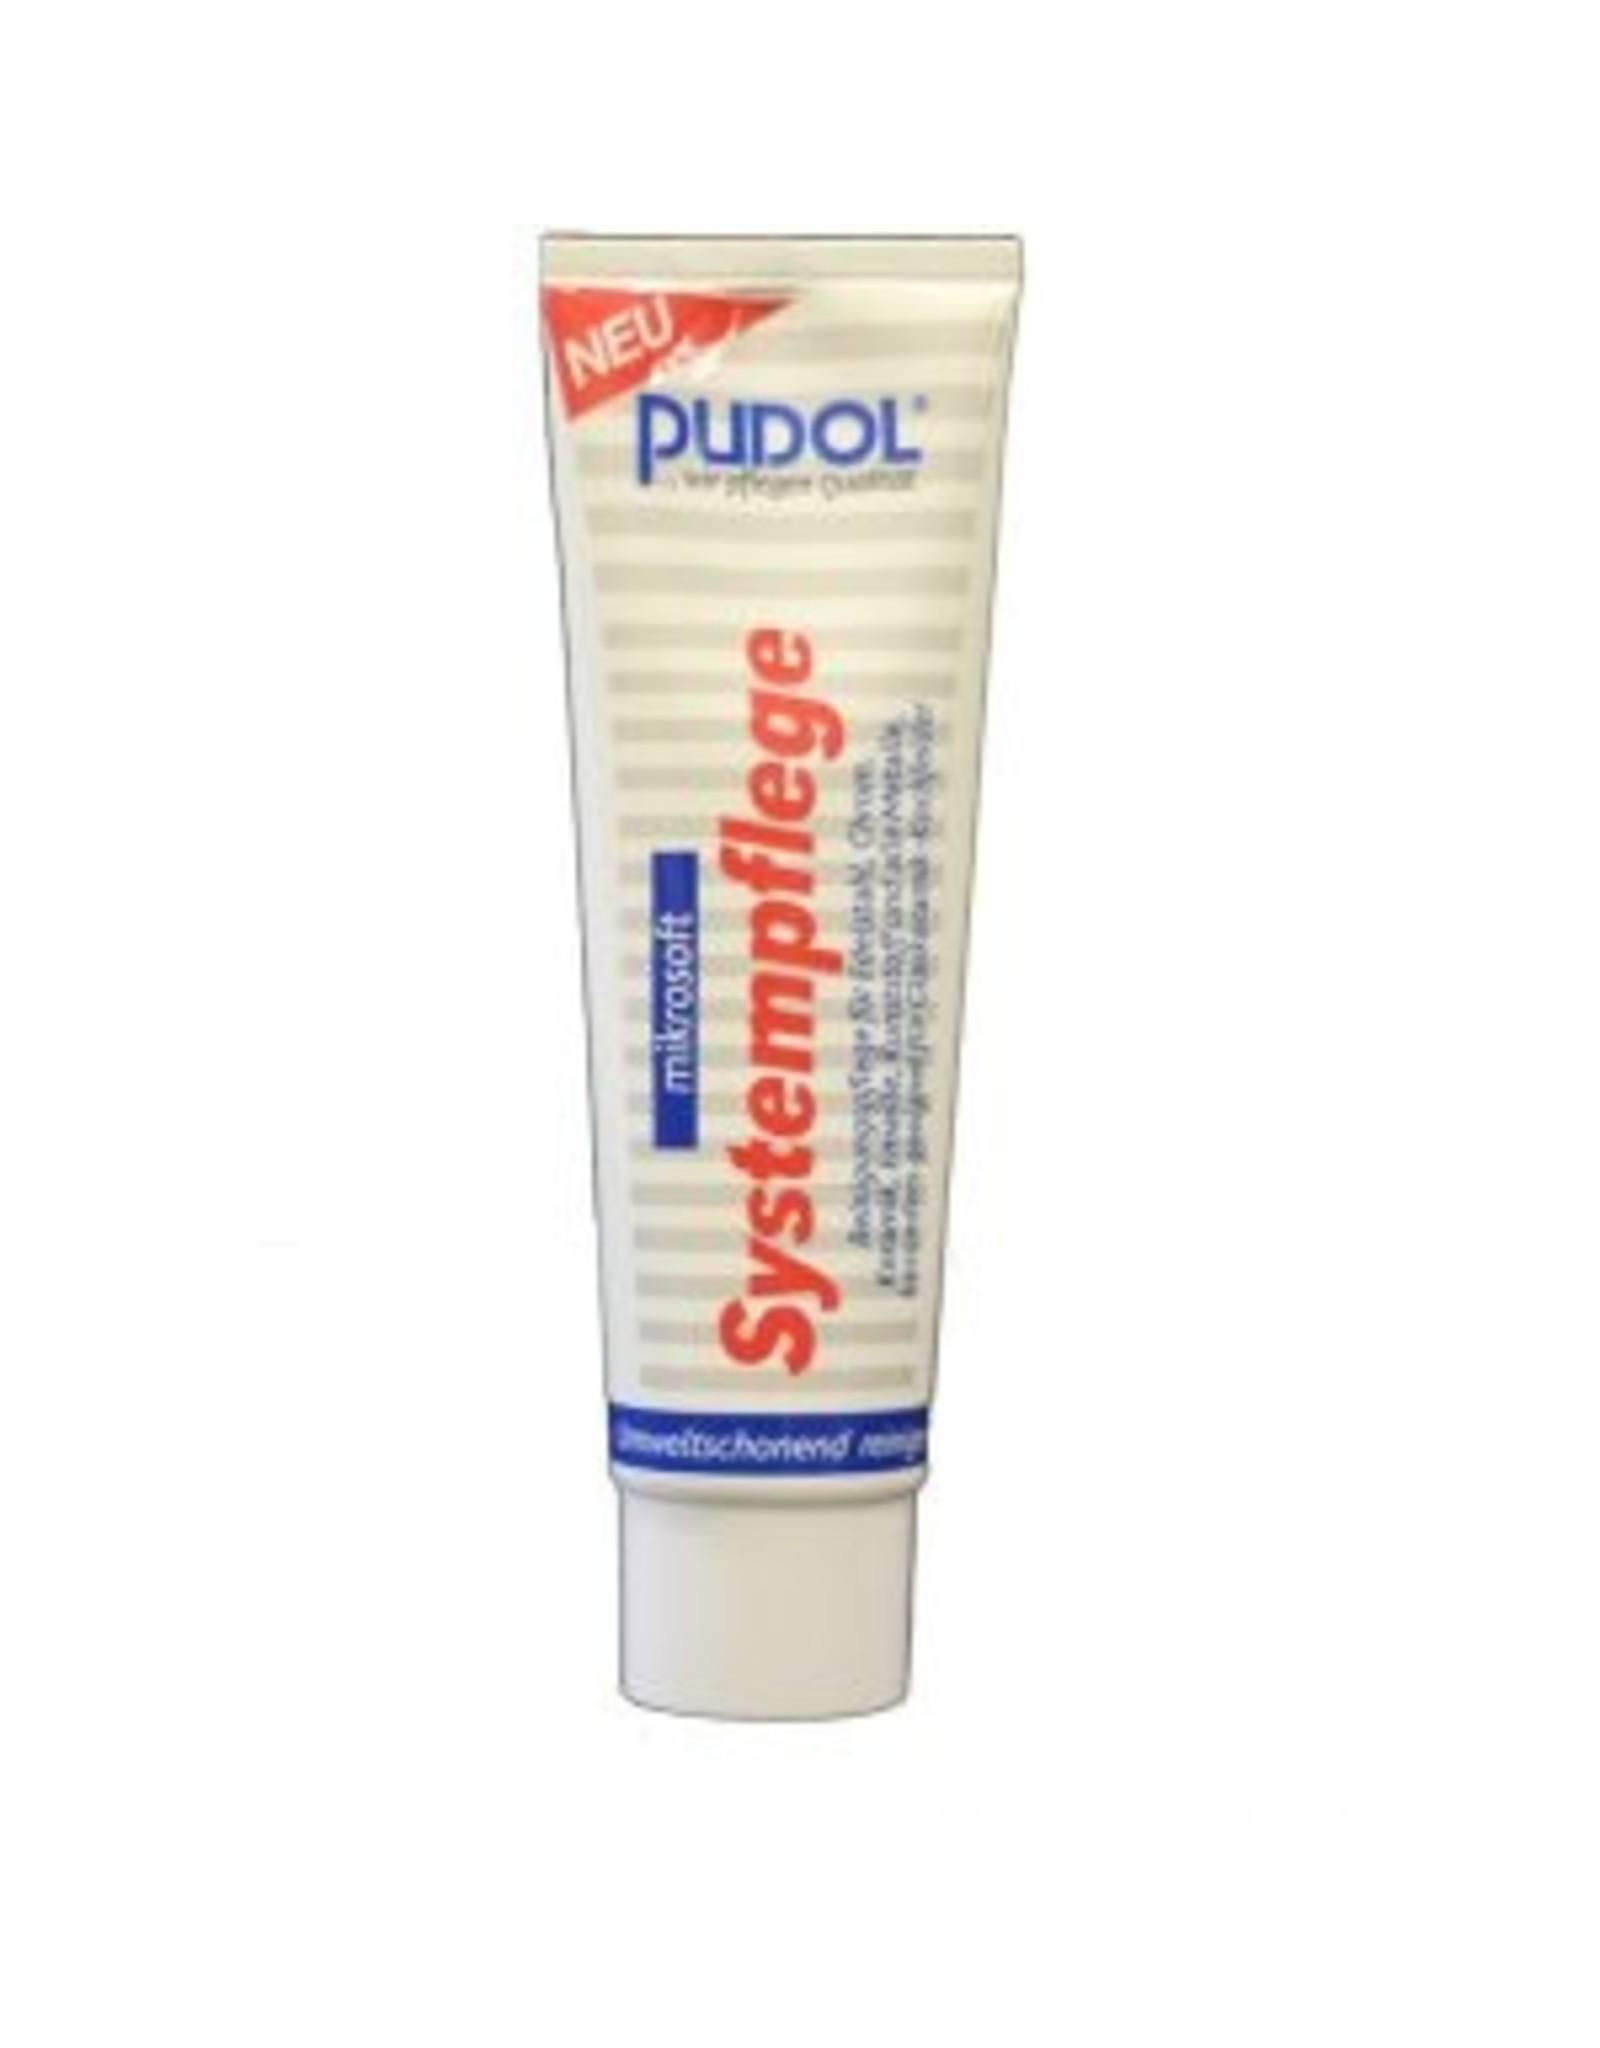 PUDOL Systempflege mikrosoft 150 ml.